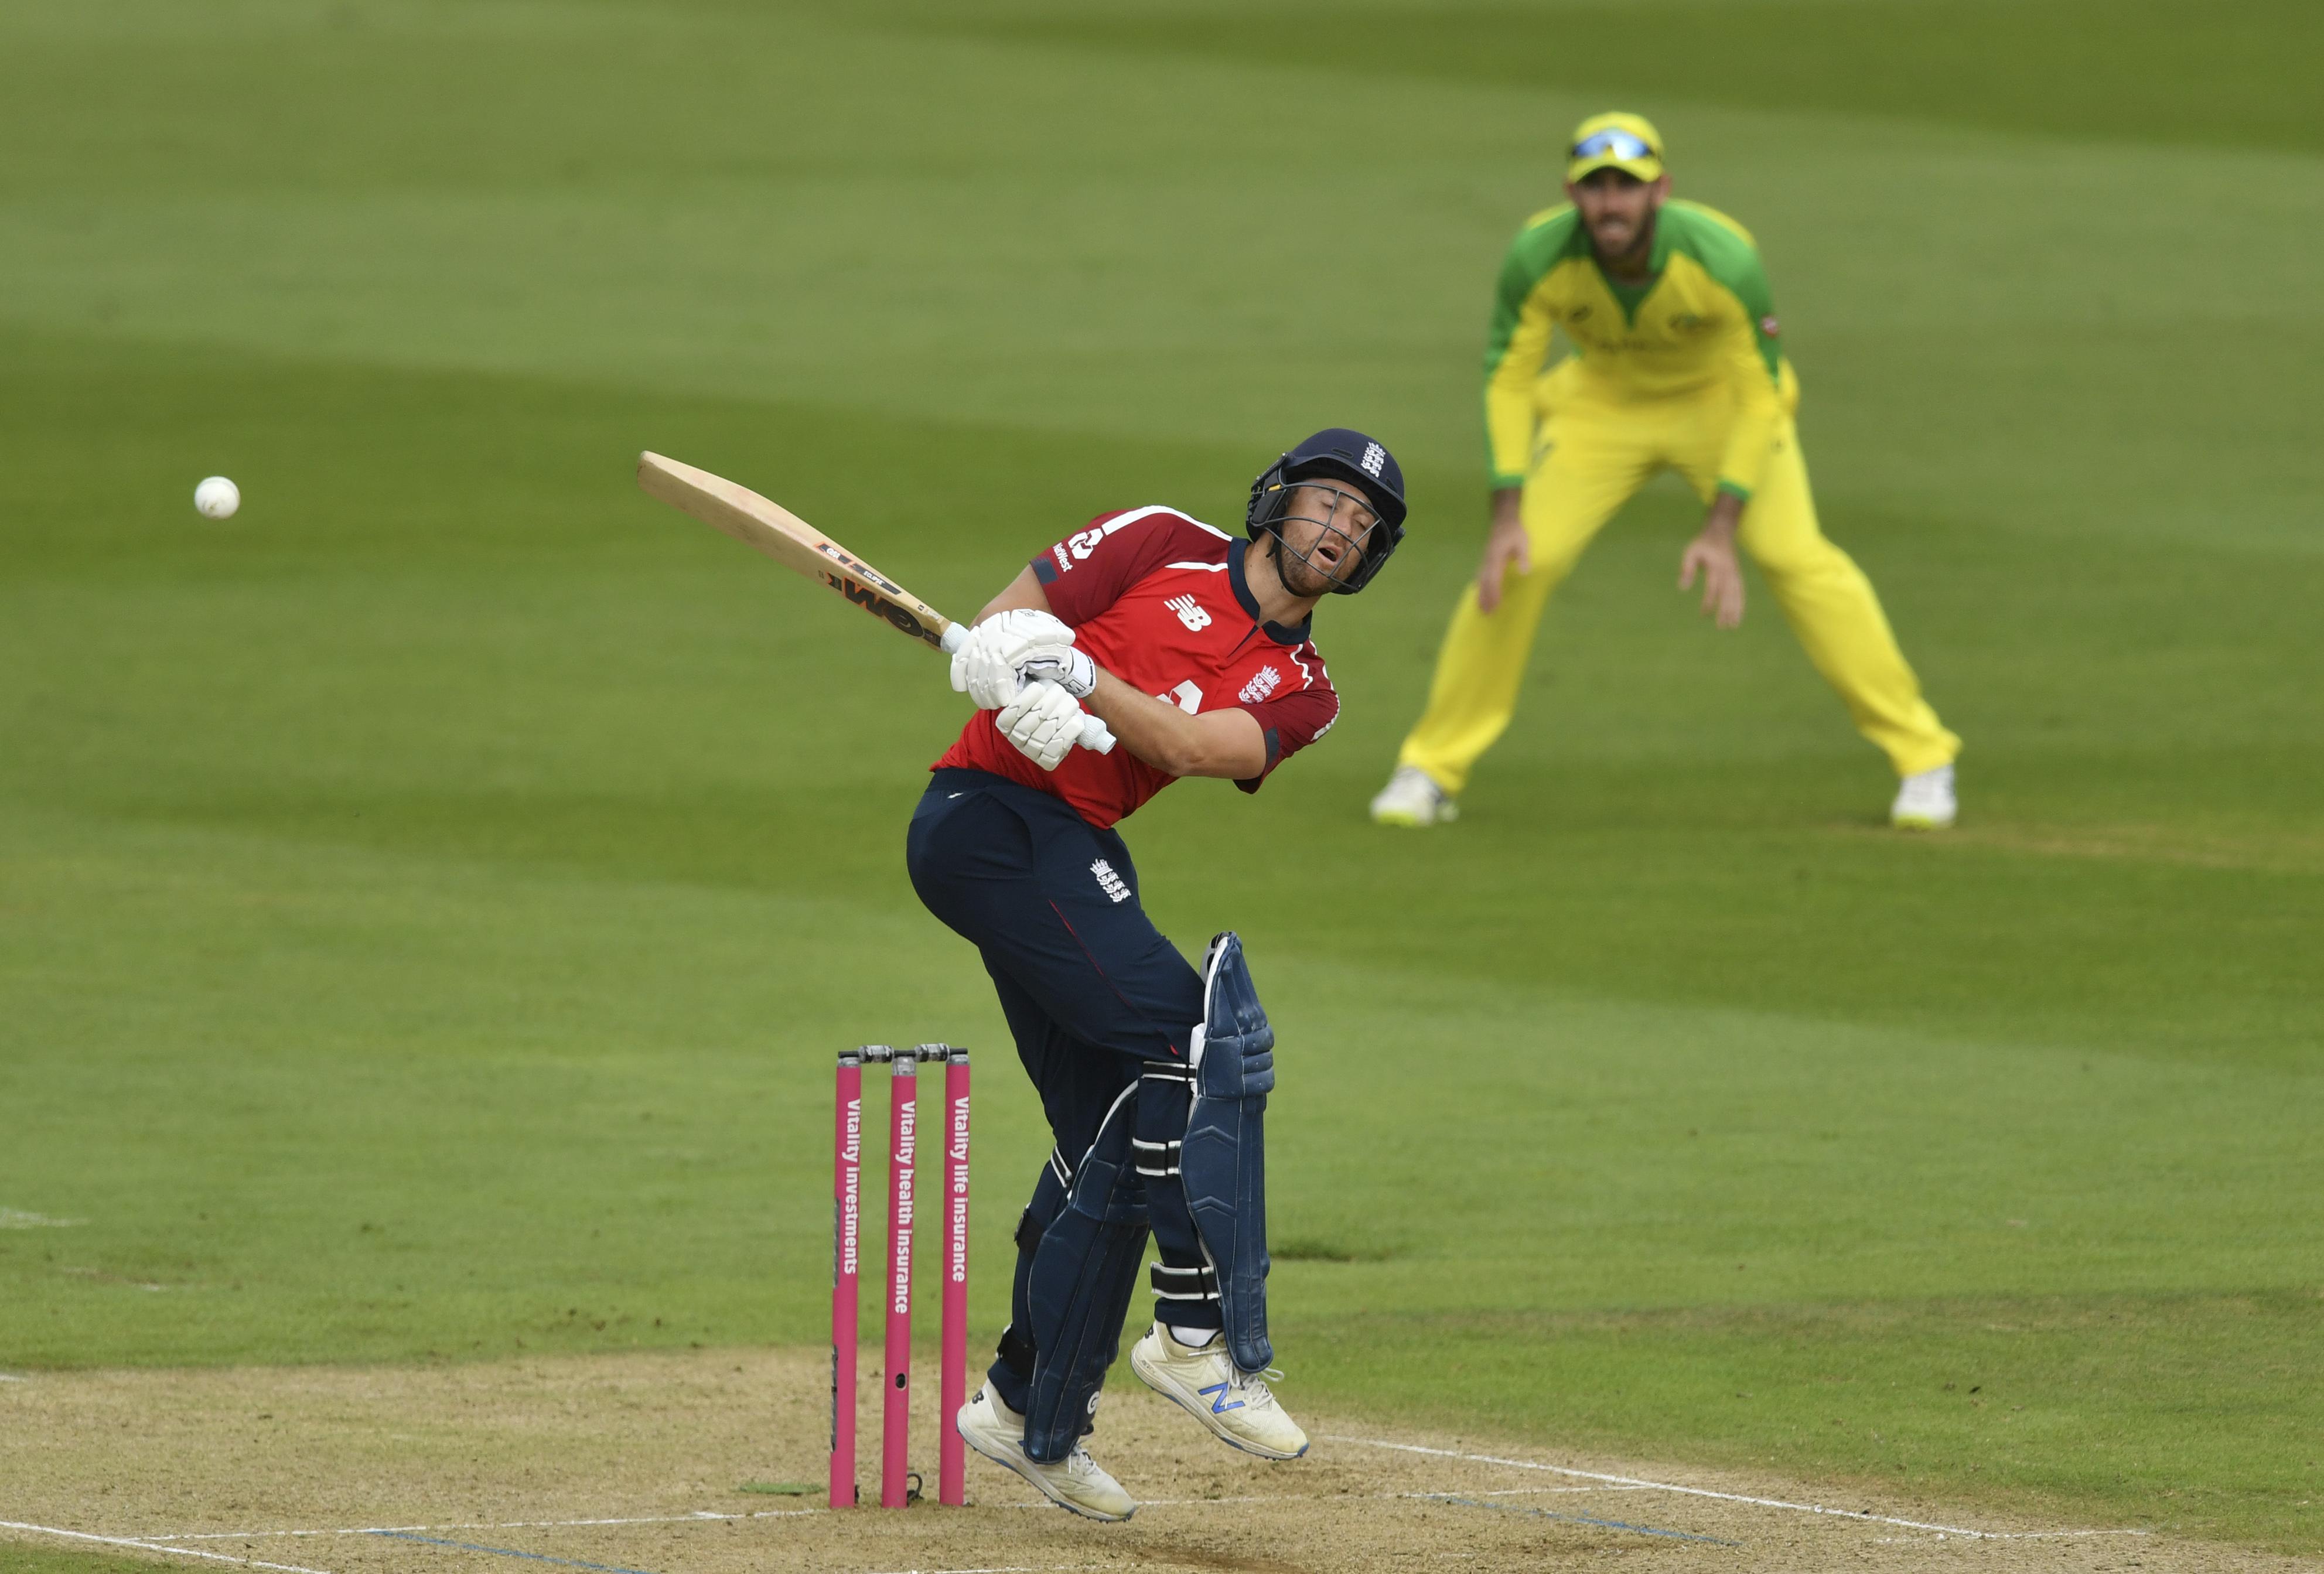 England's Dawid Malan bats during the second Twenty20 cricket match between England and Australia, at the Ageas Bowl in Southampton, England, Sunday, Sept. 6, 2020. (Dan Mullan/Pool via AP)